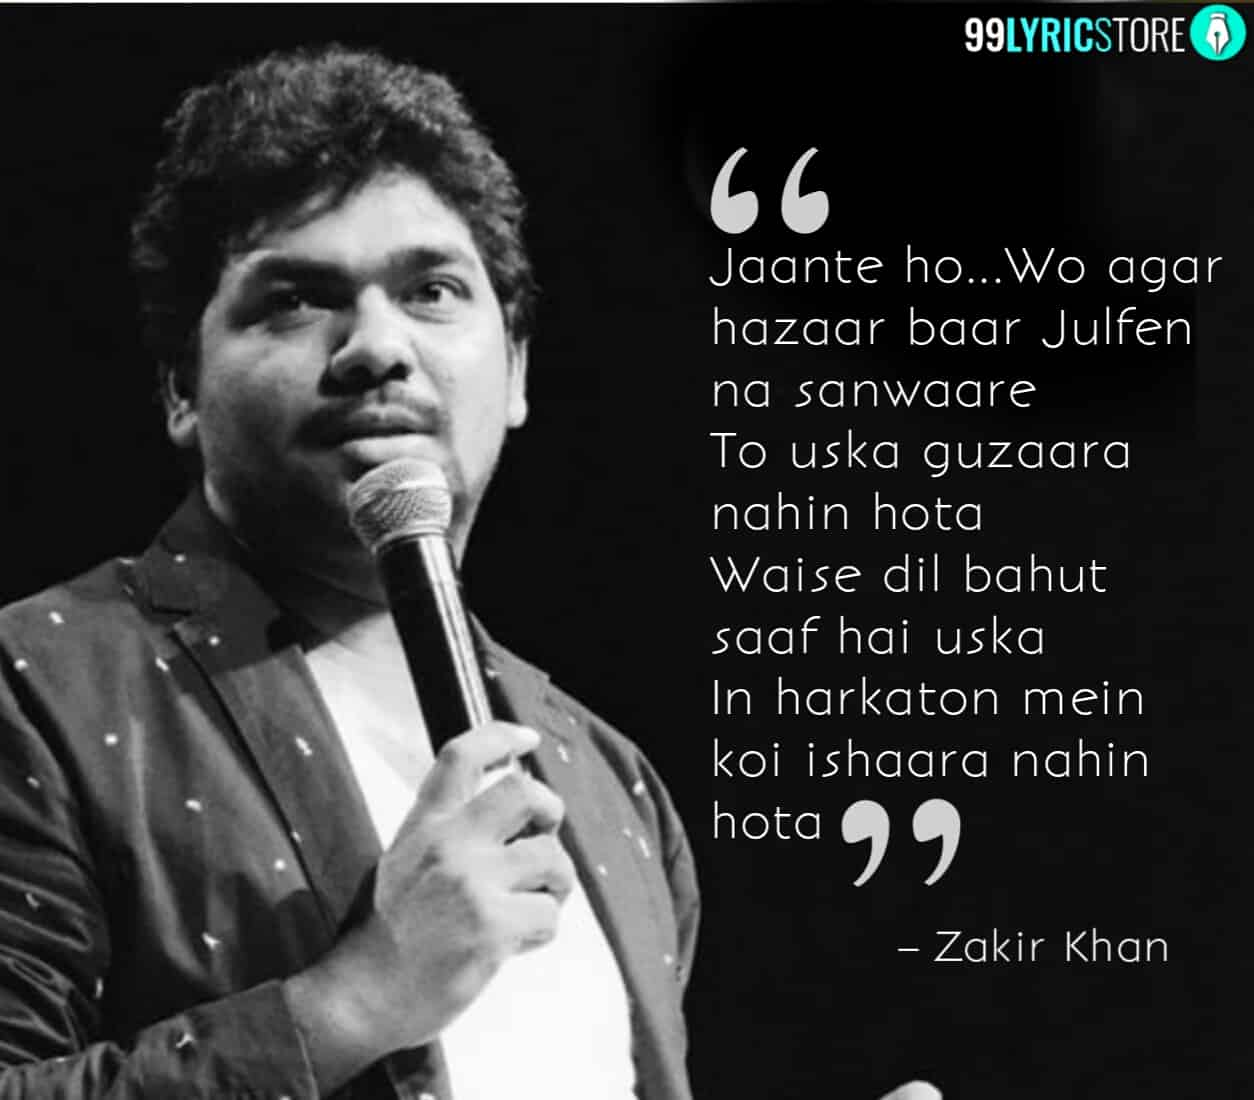 This beautiful Poem 'Ye Khat Hai Us Guldaan Ke Naam' has written and performed by Zakir Khan for Rekhta.